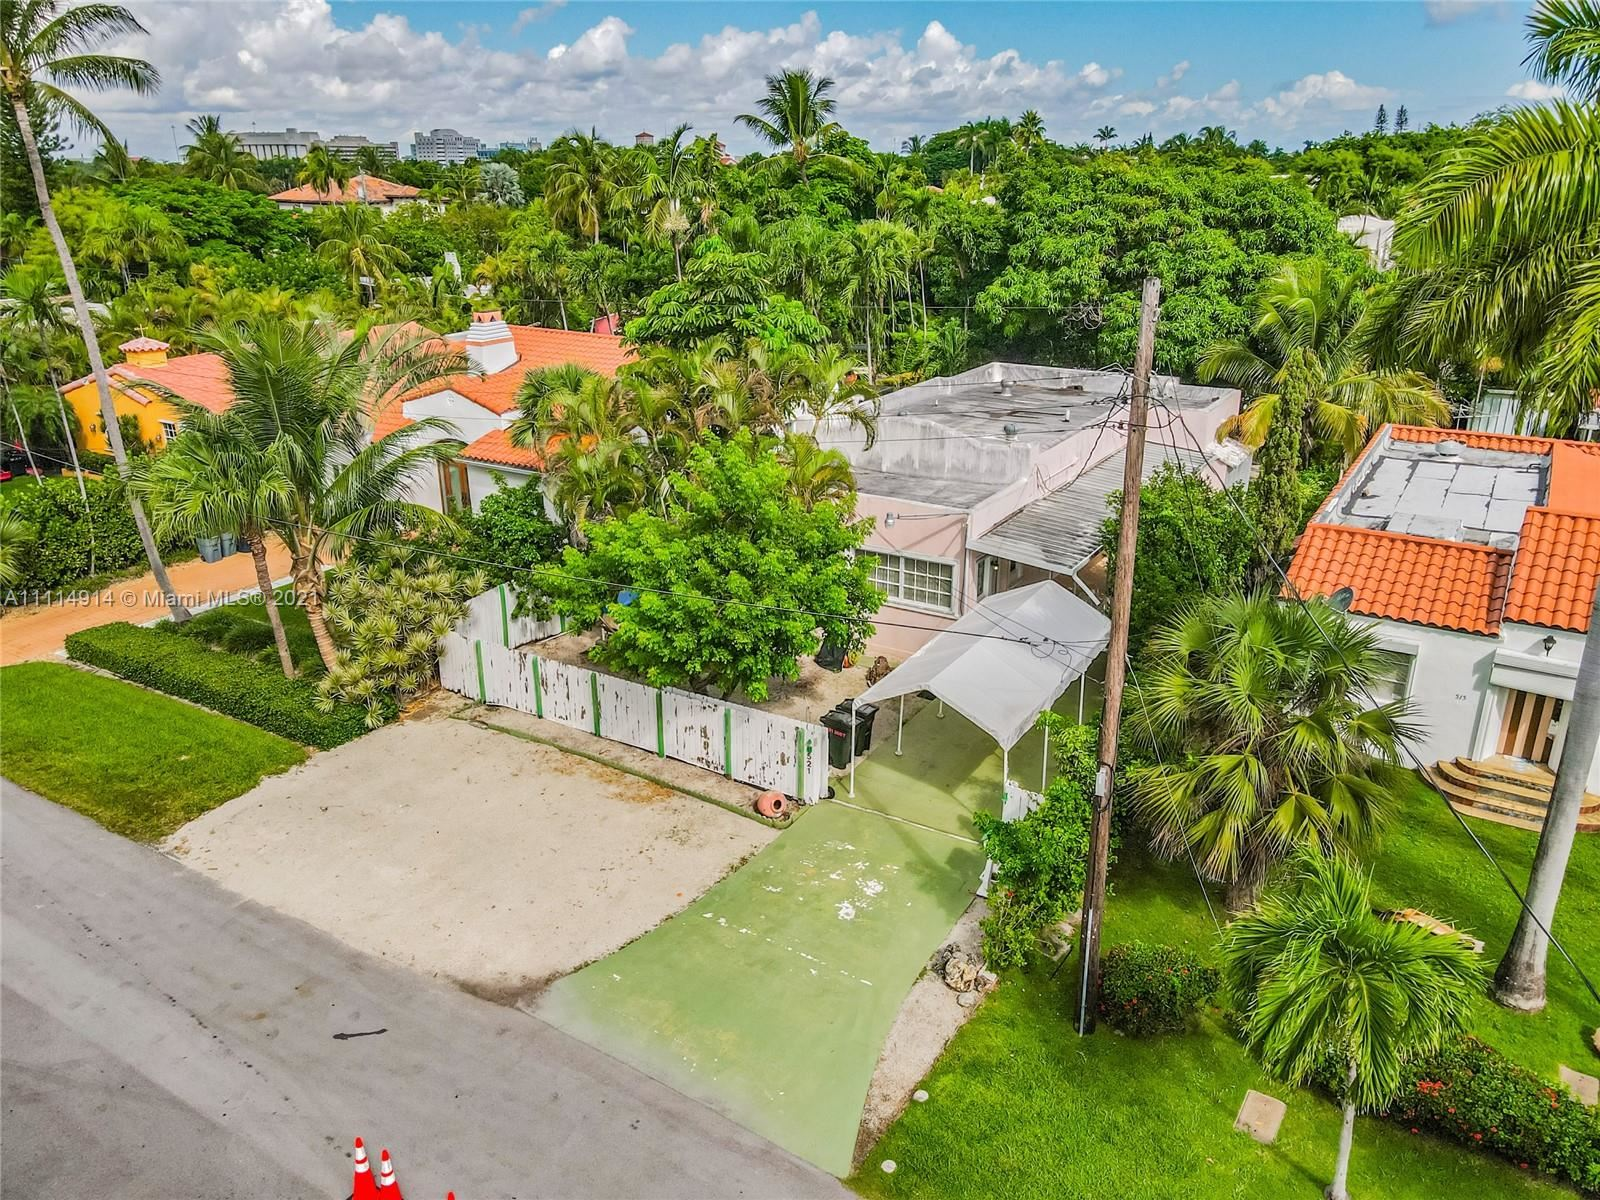 Photo of 521 W 30th St, Miami Beach, FL 33140 (MLS # A11114914)